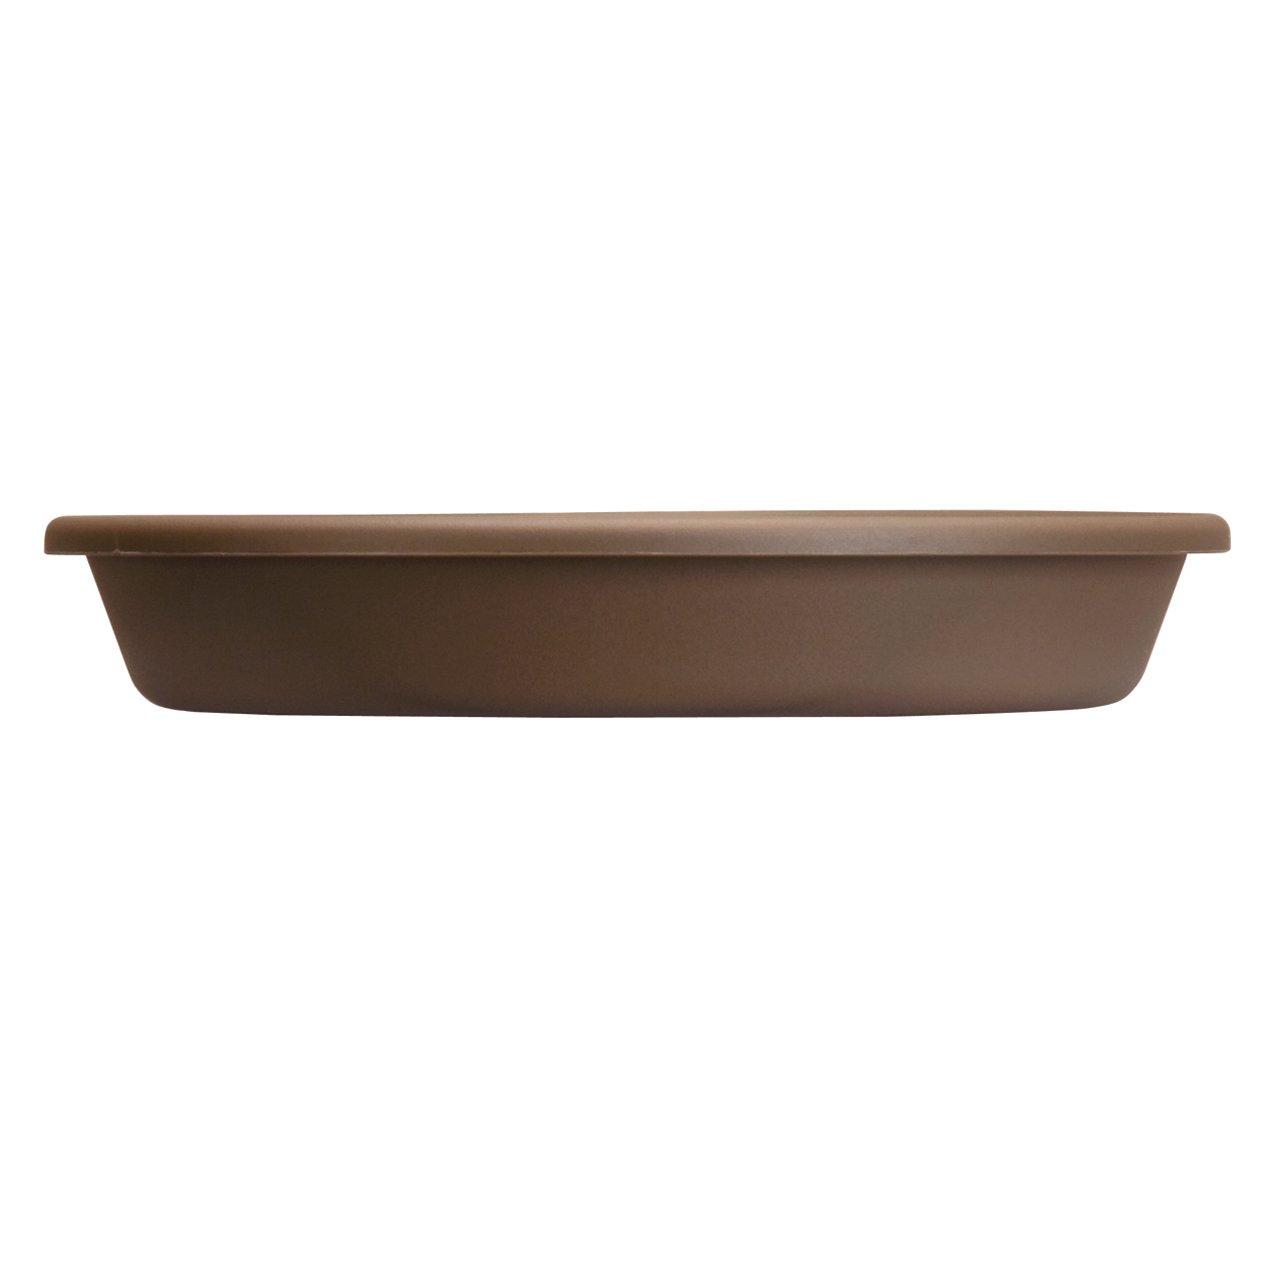 Akro Mils SLI10000E21 Classic Saucer for 10-Inch Classic Pot, Chocolate, 10.75-Inch